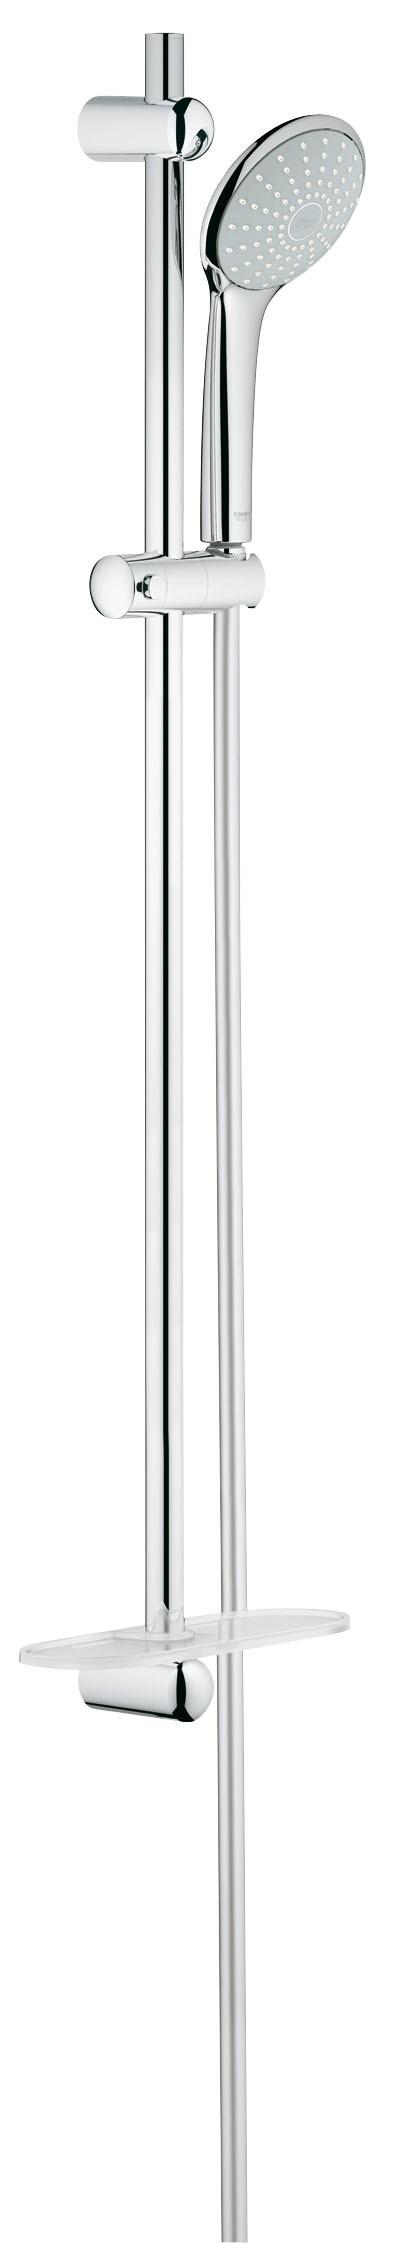 Grohe 27267001 Euphoria (ручной душ, штанга 900 мм, шланг 1750 мм), хром (27267001)